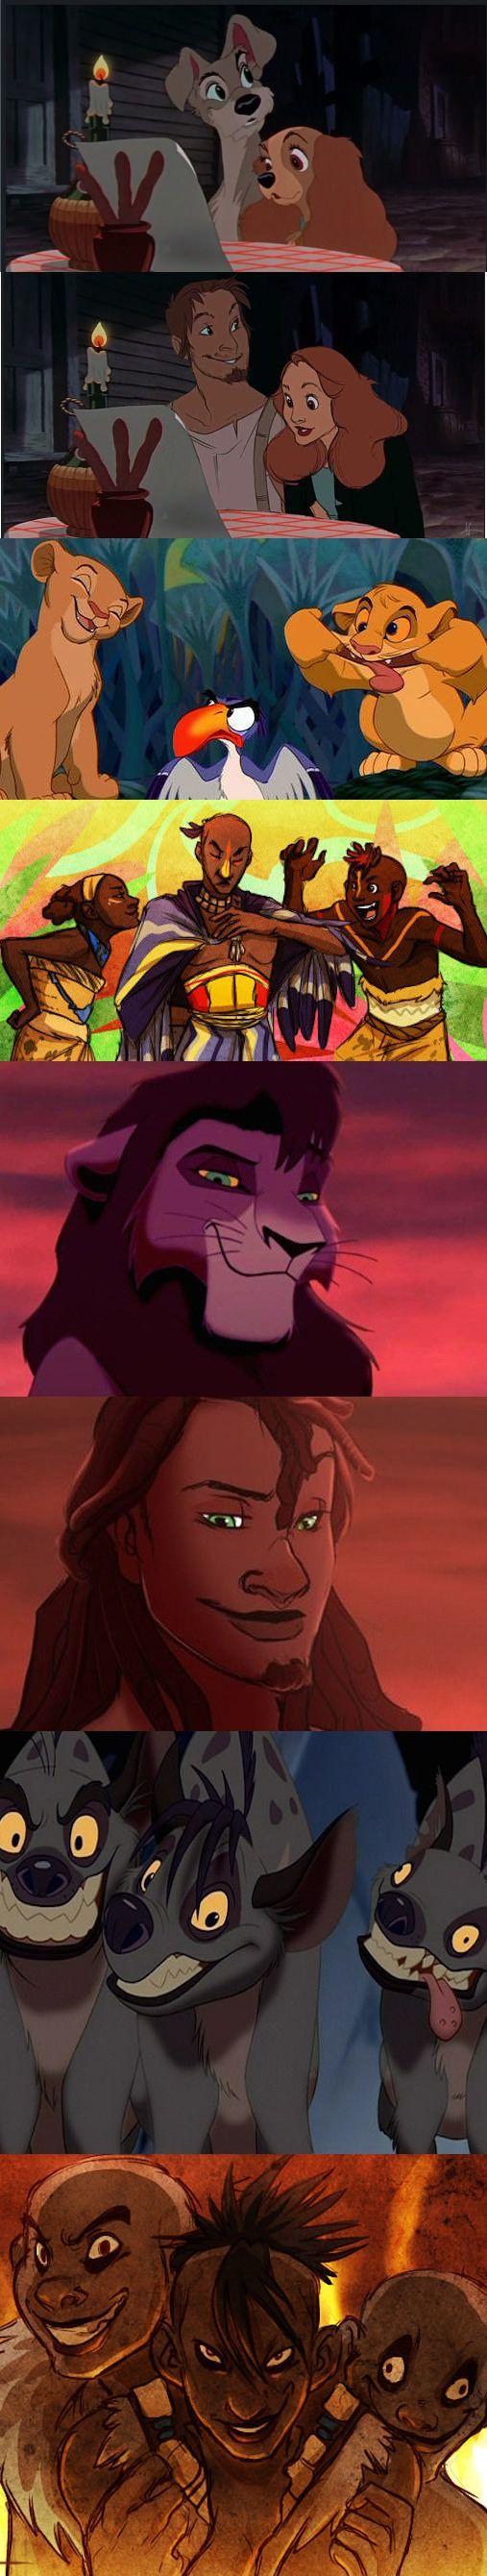 Disney animals into humans (Part 2)